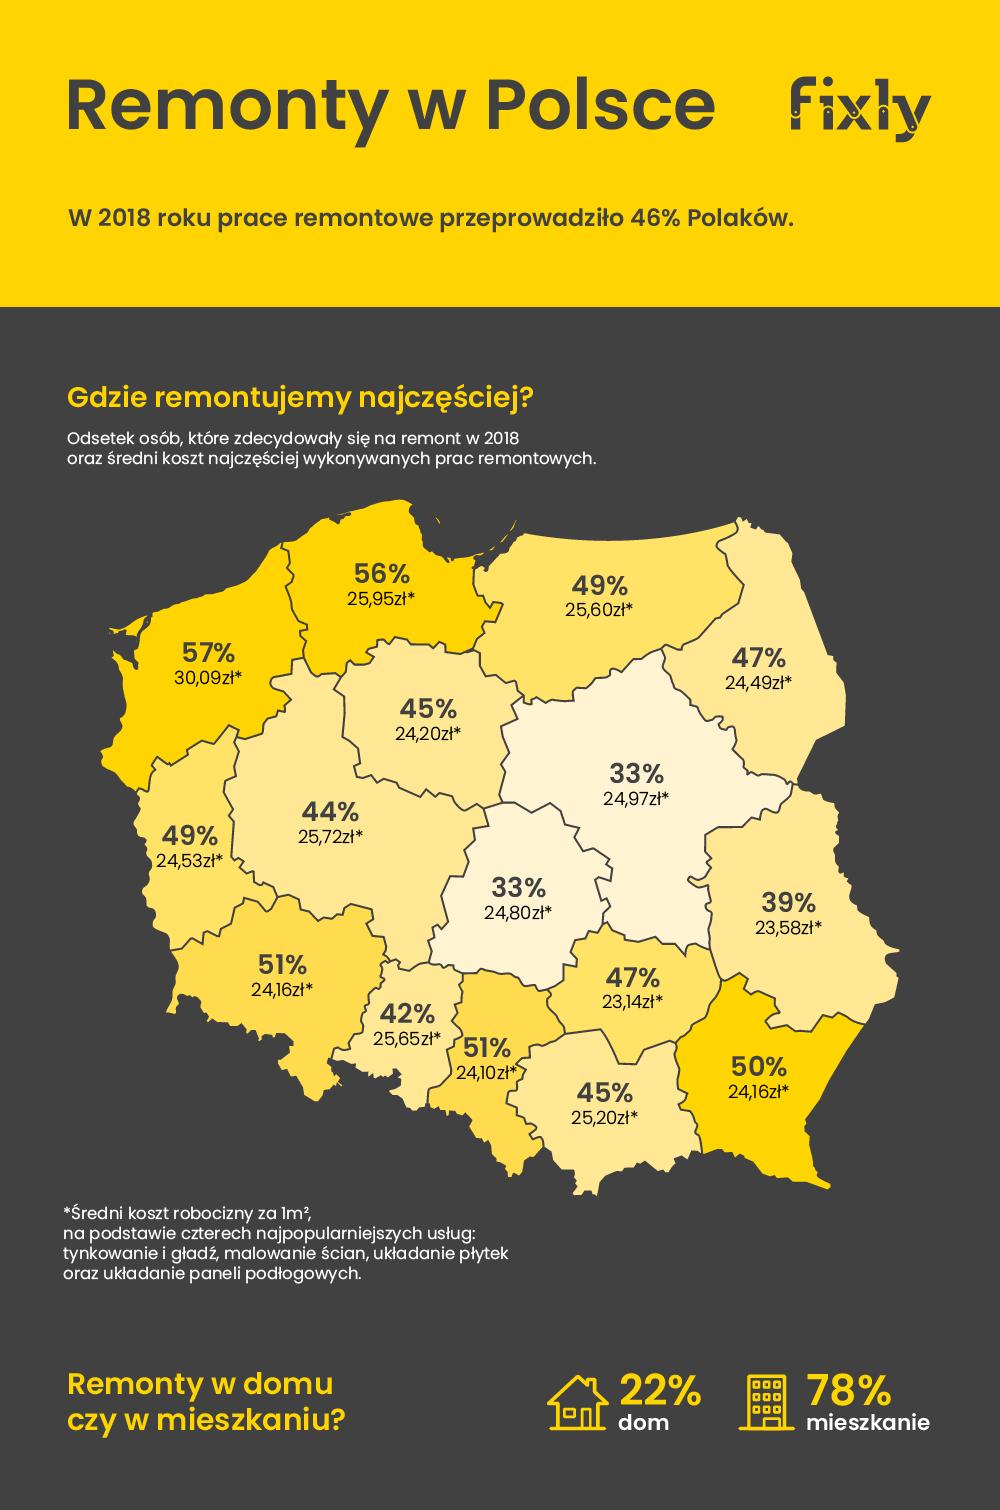 Jak Remontują Polacy Raport 2018 Blog Fixlypl